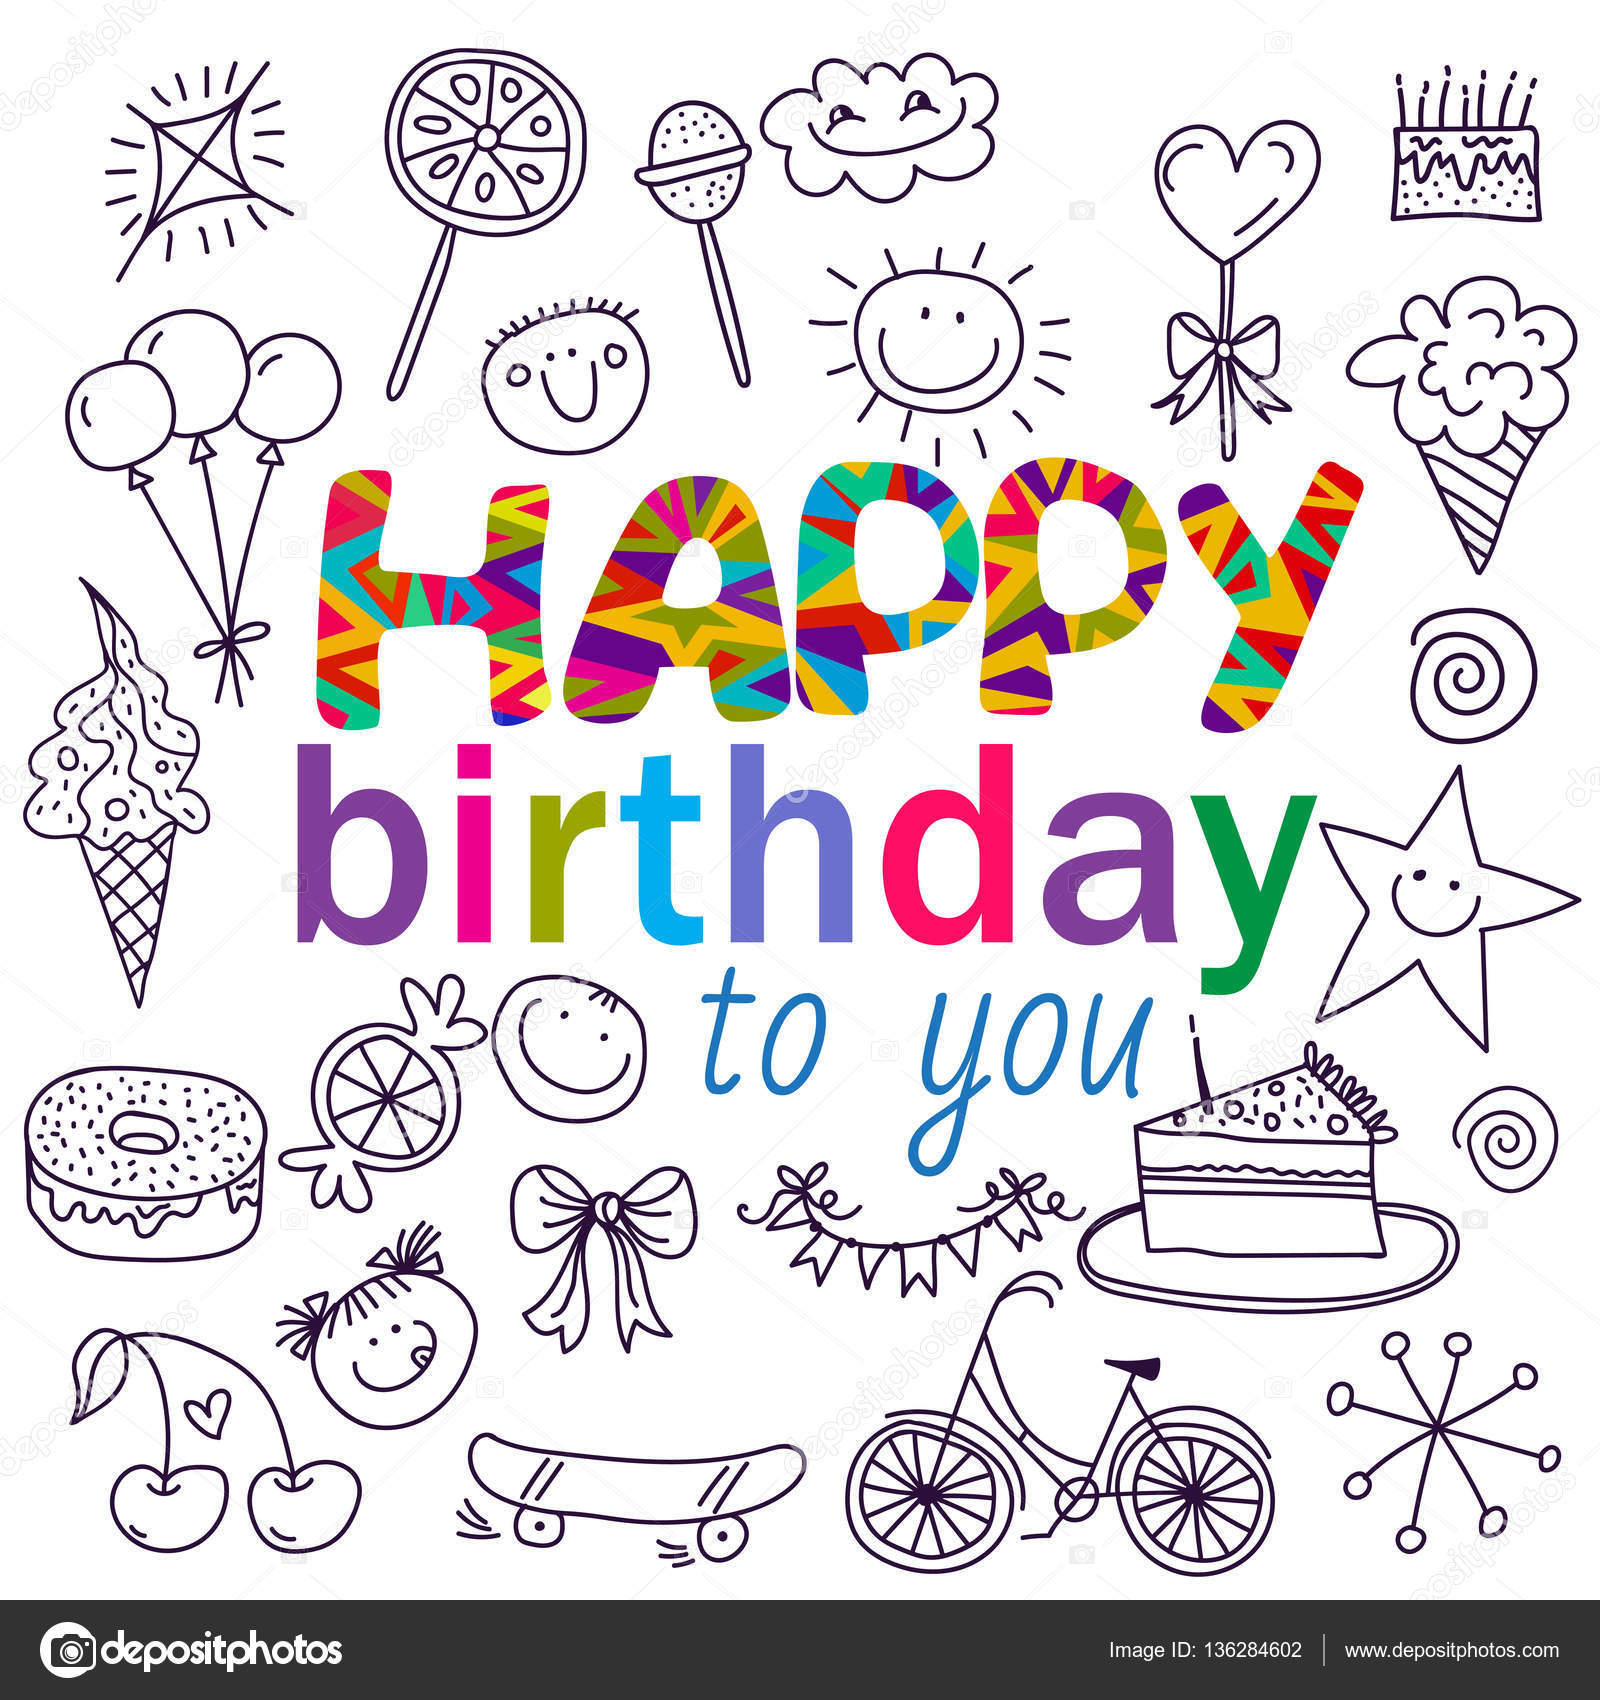 Plakat für die Geburtstagsgrüße — Stockvektor © color885 #136284602